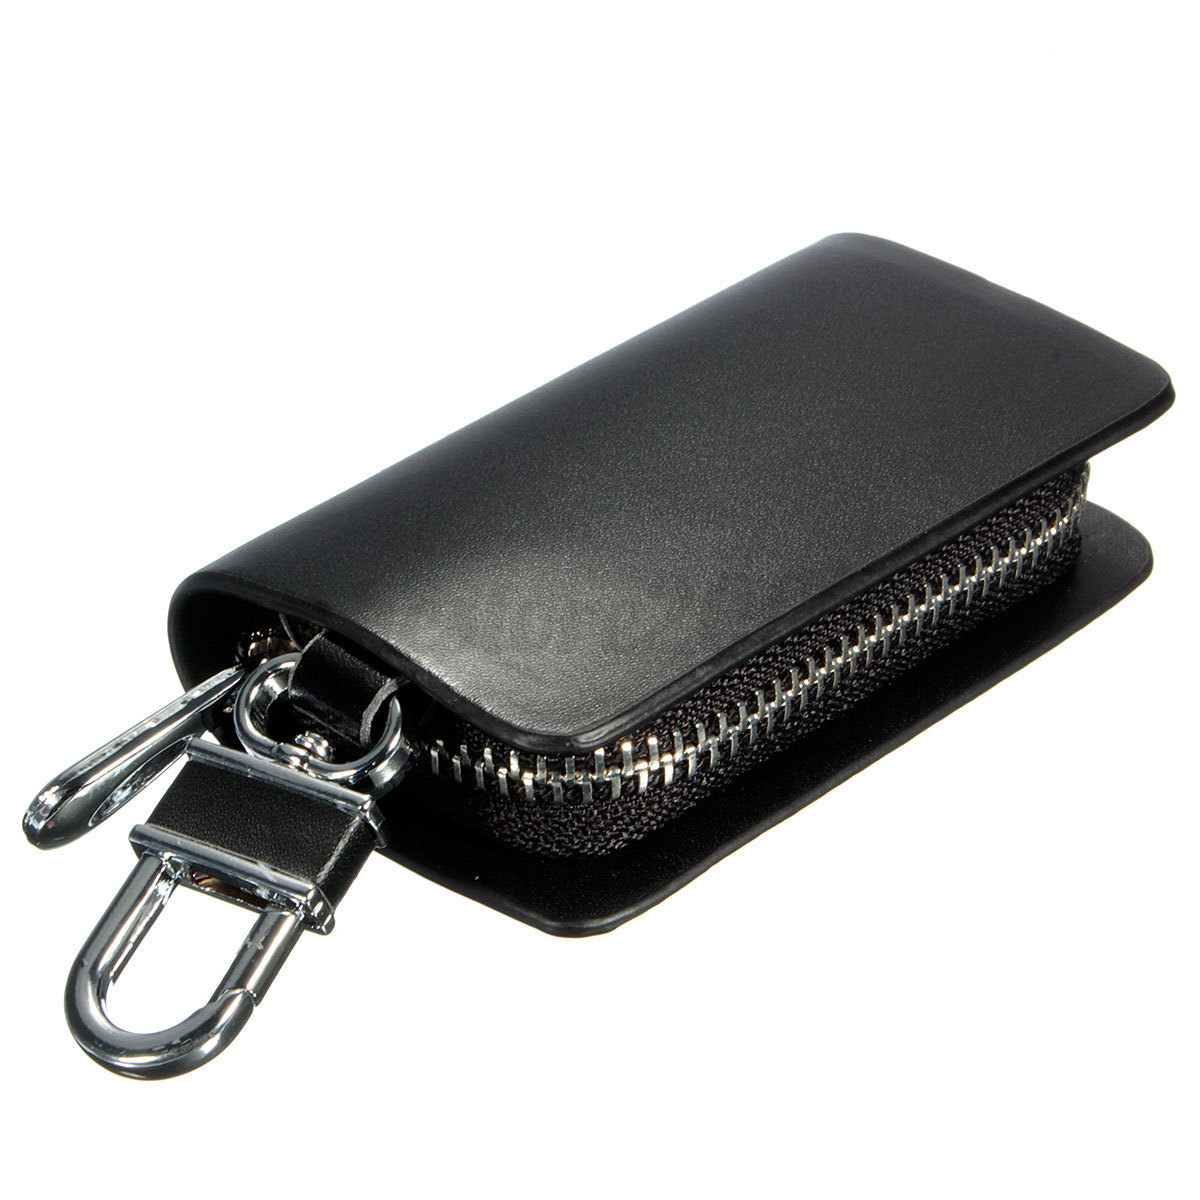 Leather Car Key Holder KeyChain Wallet Case Pouch Purse